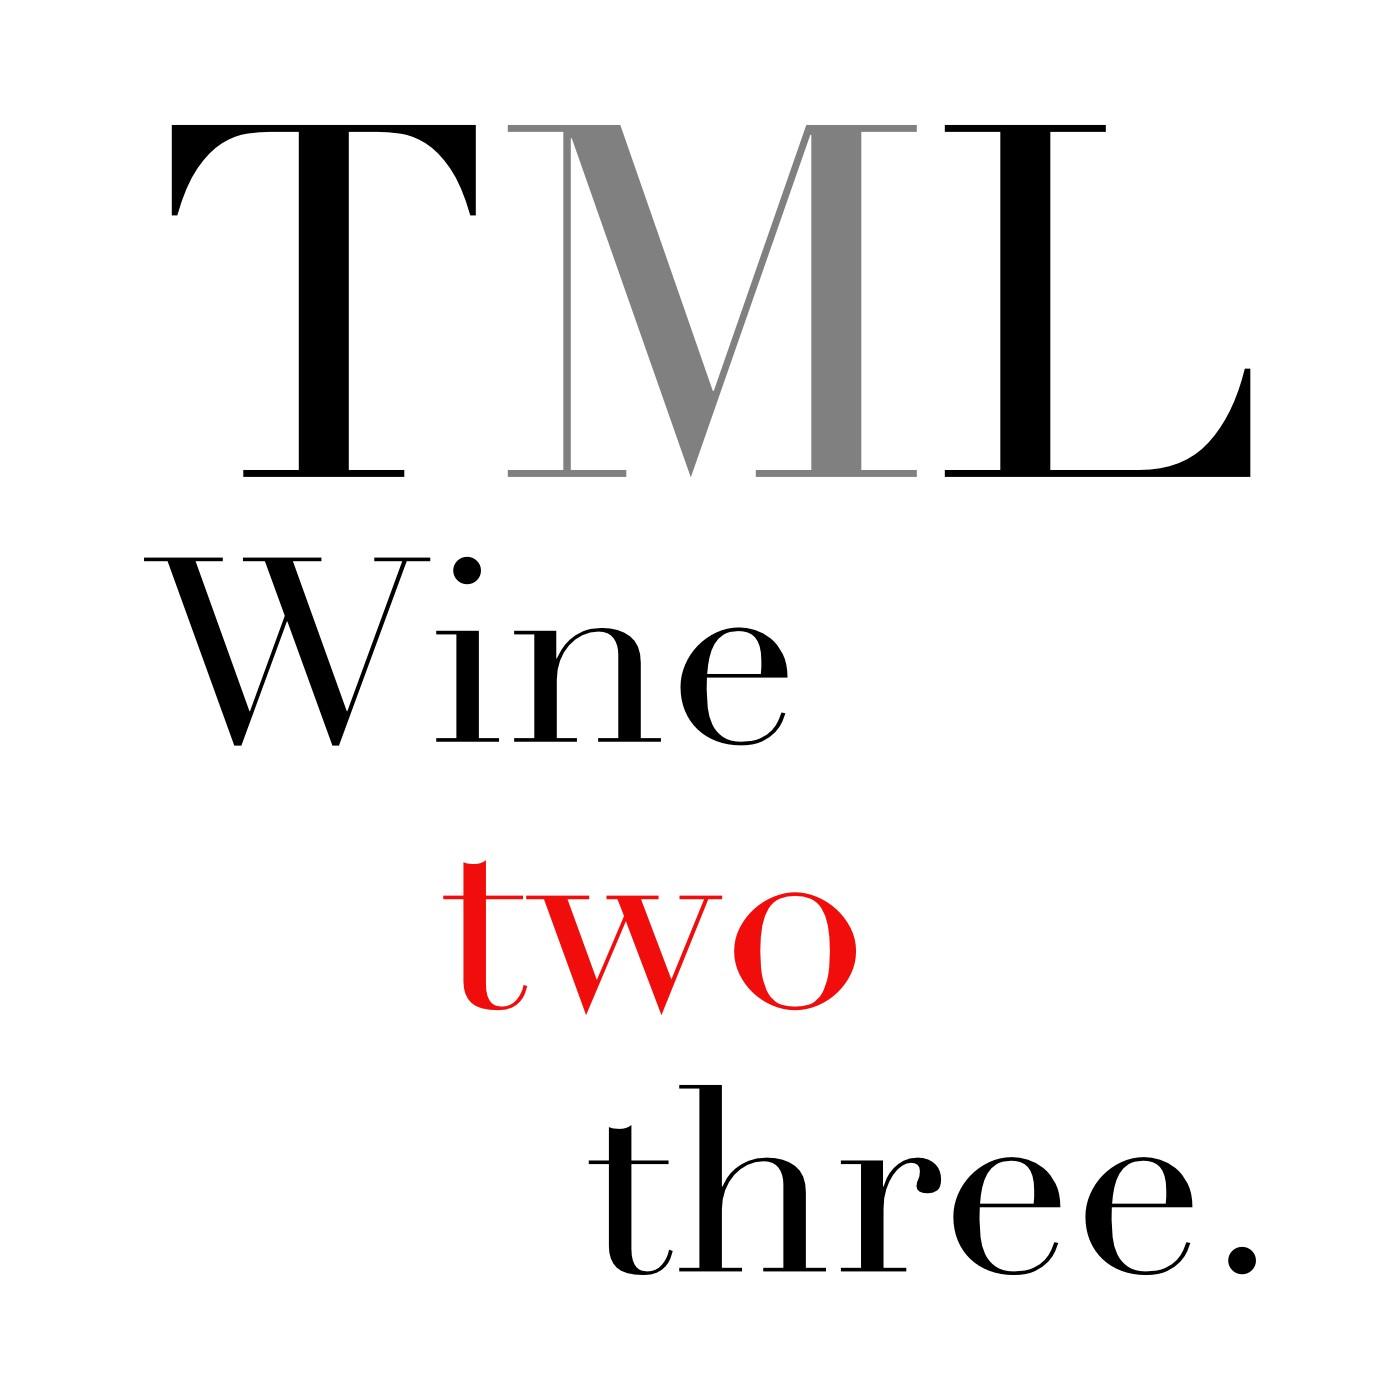 Wine Two Three